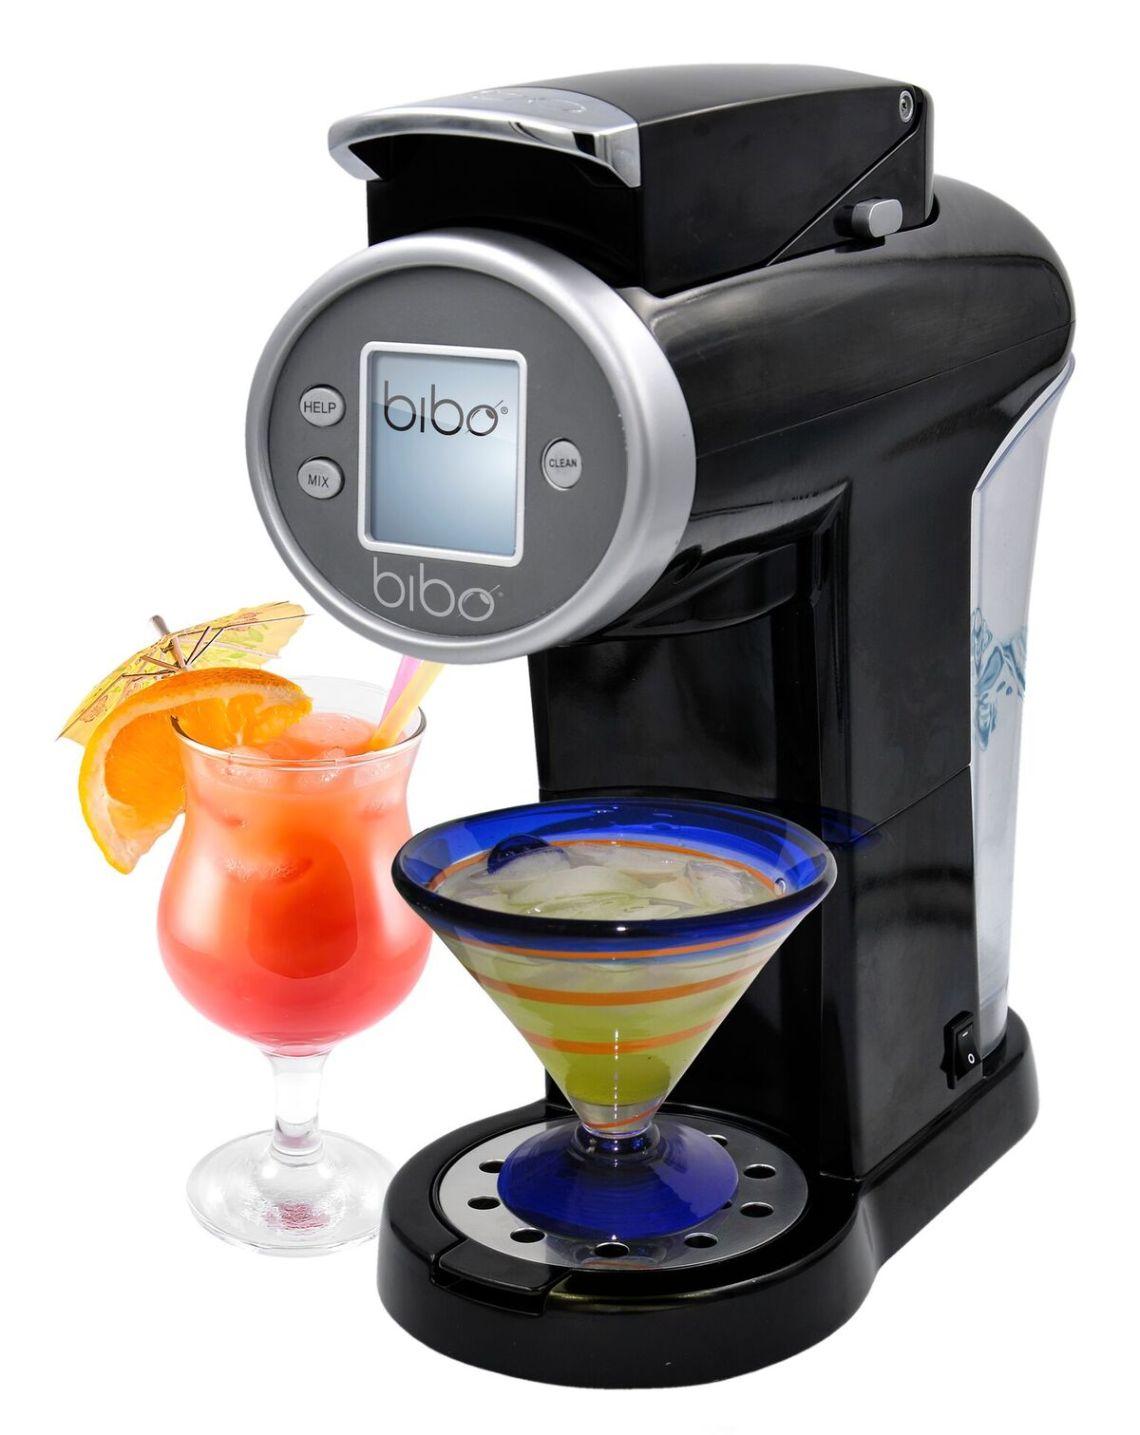 Bibo Barmaid Cocktail System